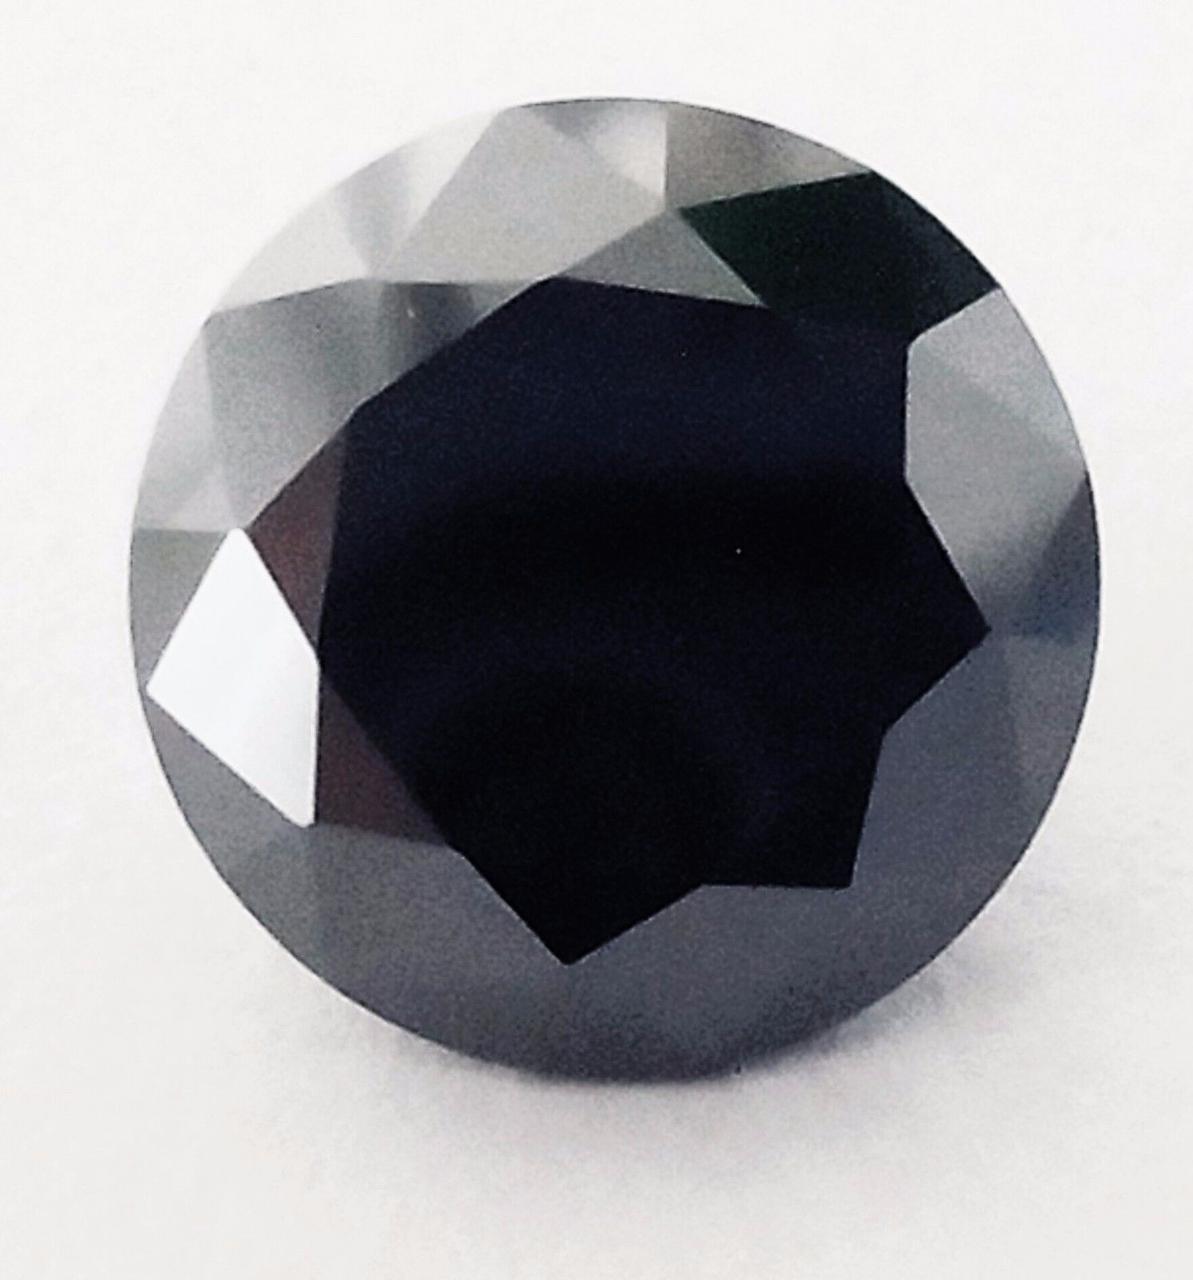 Бриллиант - Муассанит  2.35 carat 8.95 mm